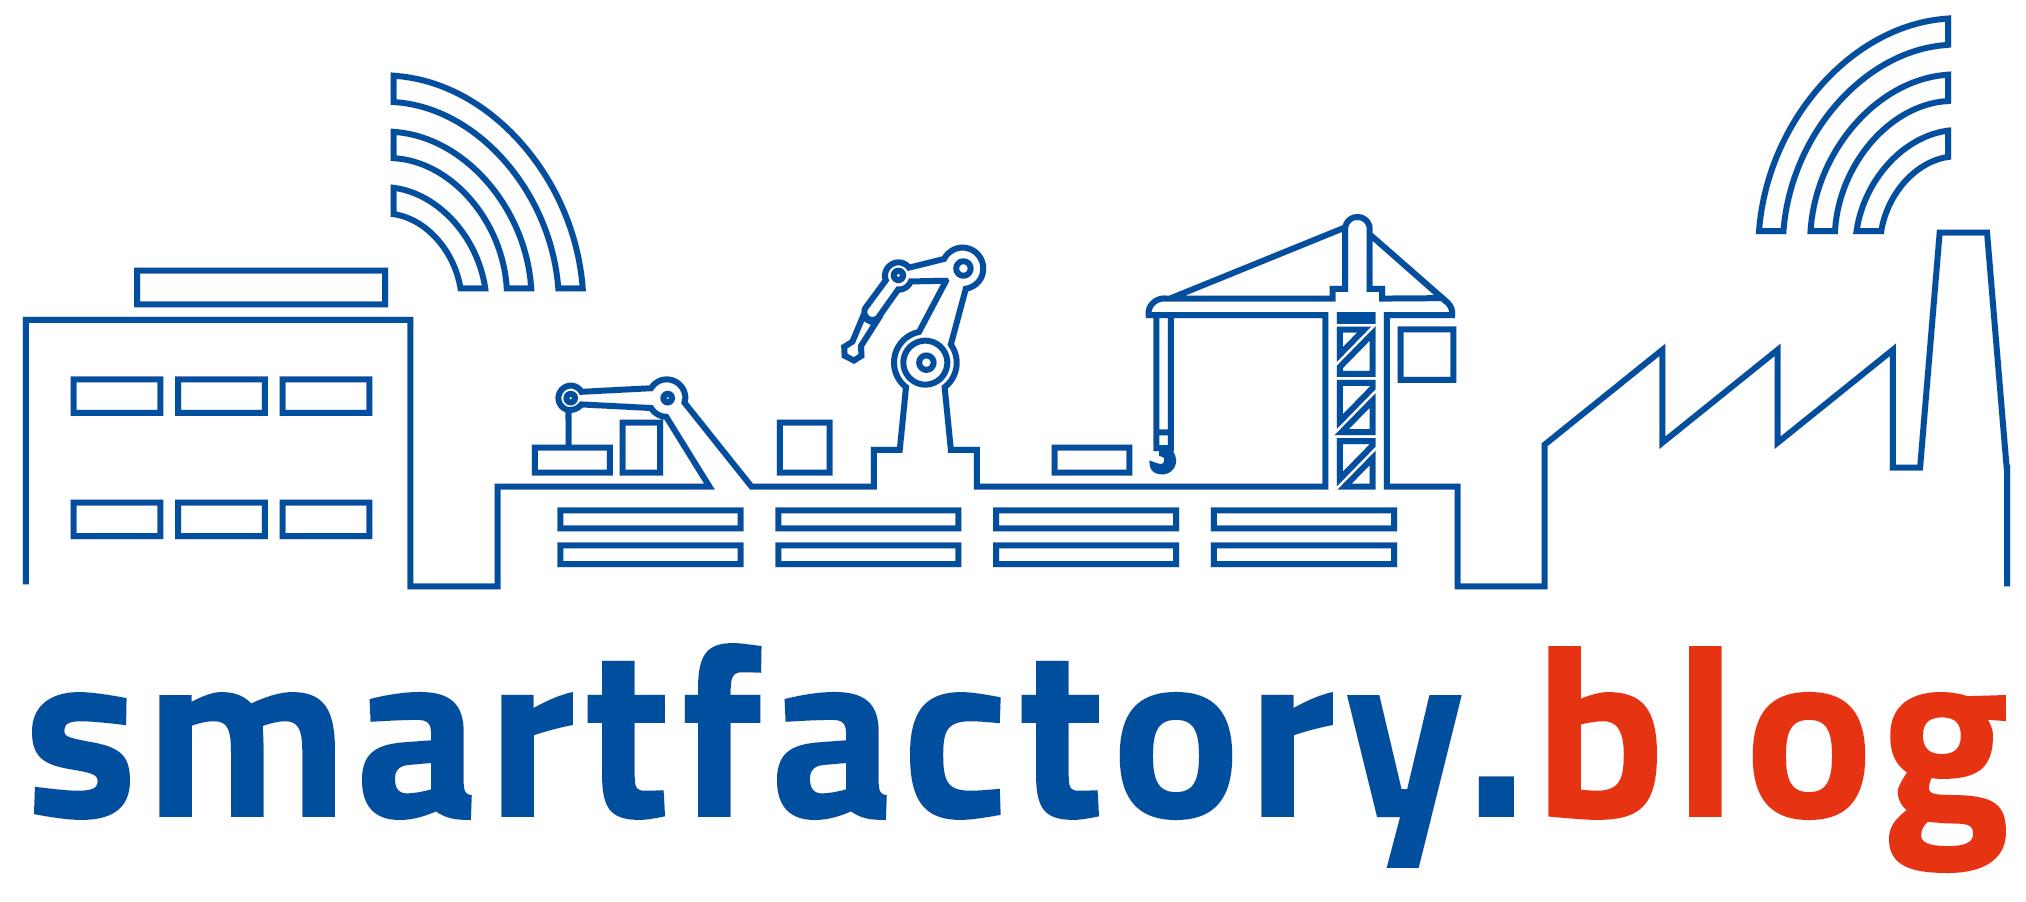 Smartfactory Blog